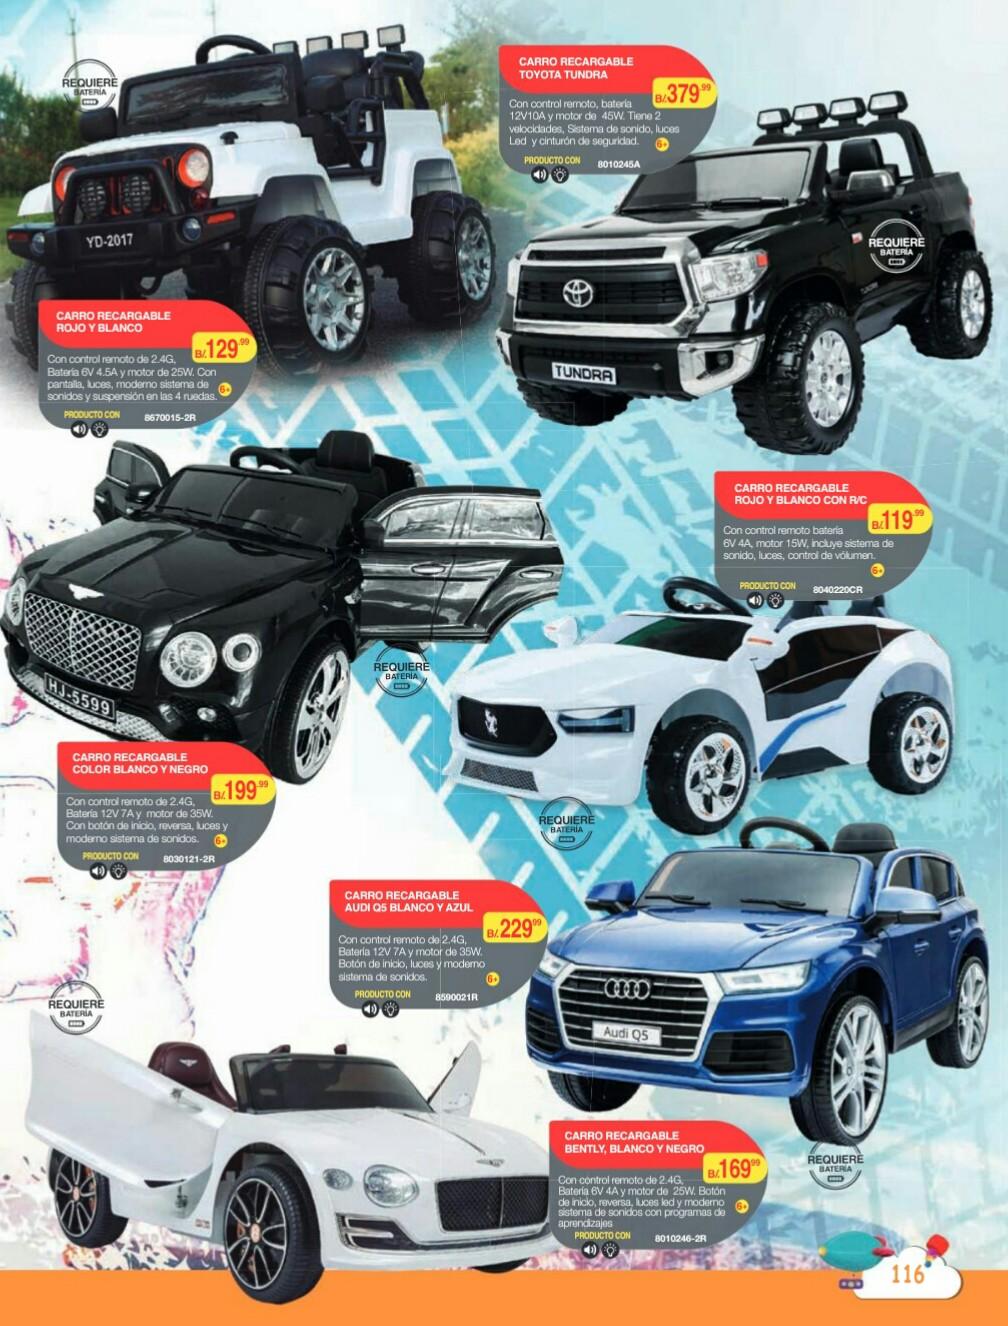 Catalogo juguetes Titan Toys 2018 p118